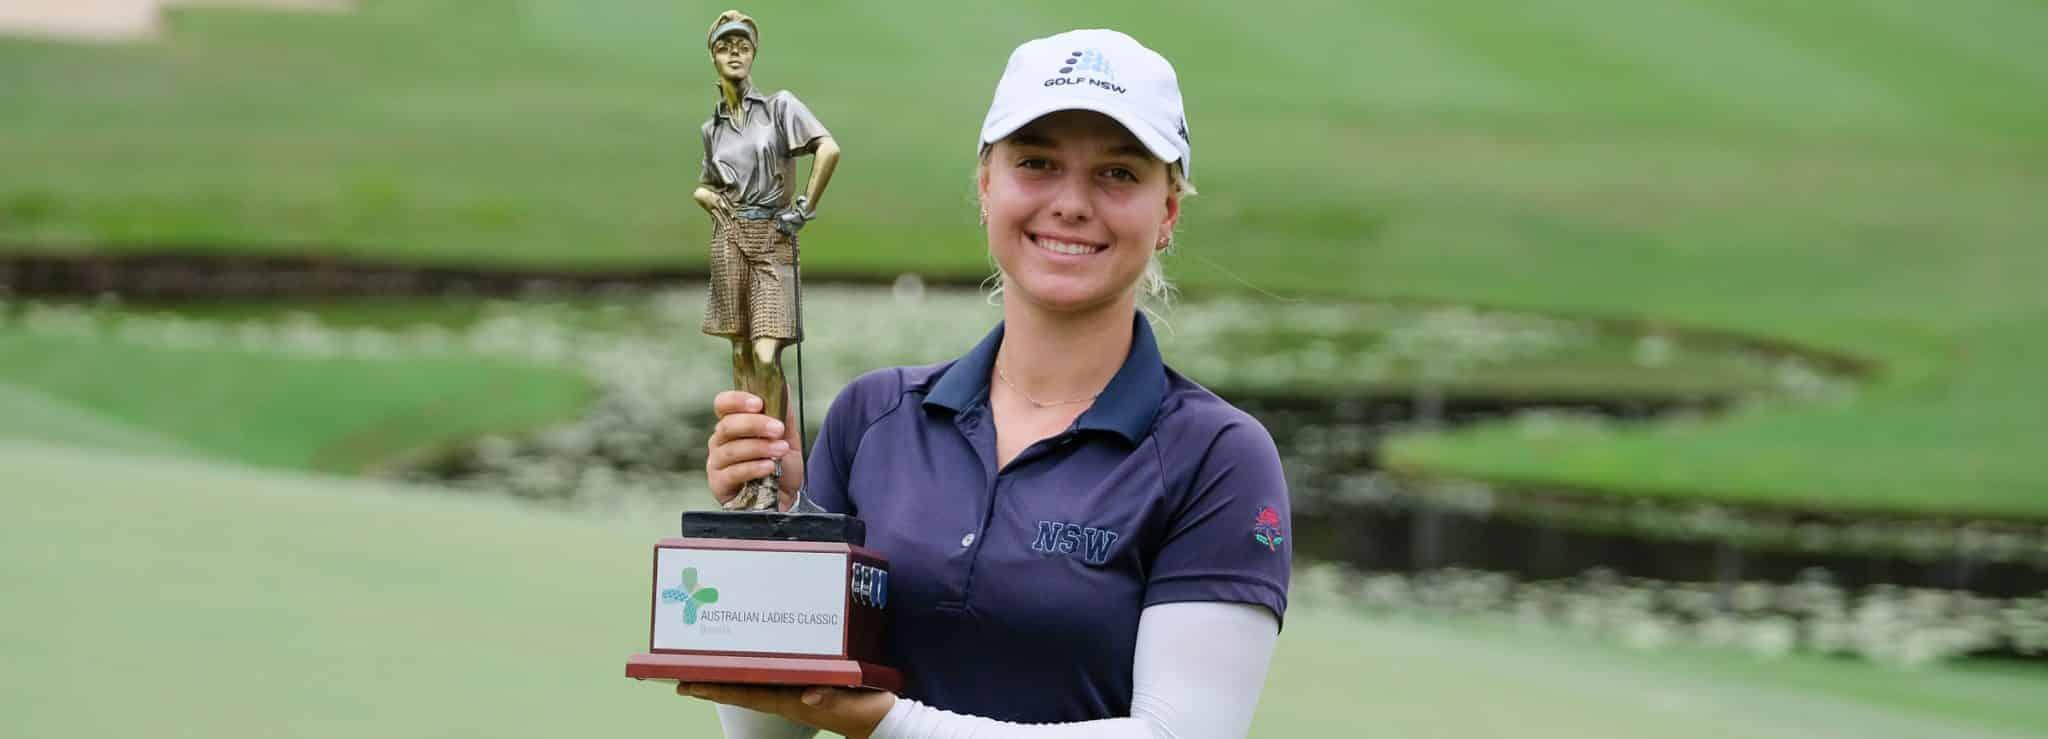 Stephanie Kyriacou holding the Australian Ladies Classic trophy